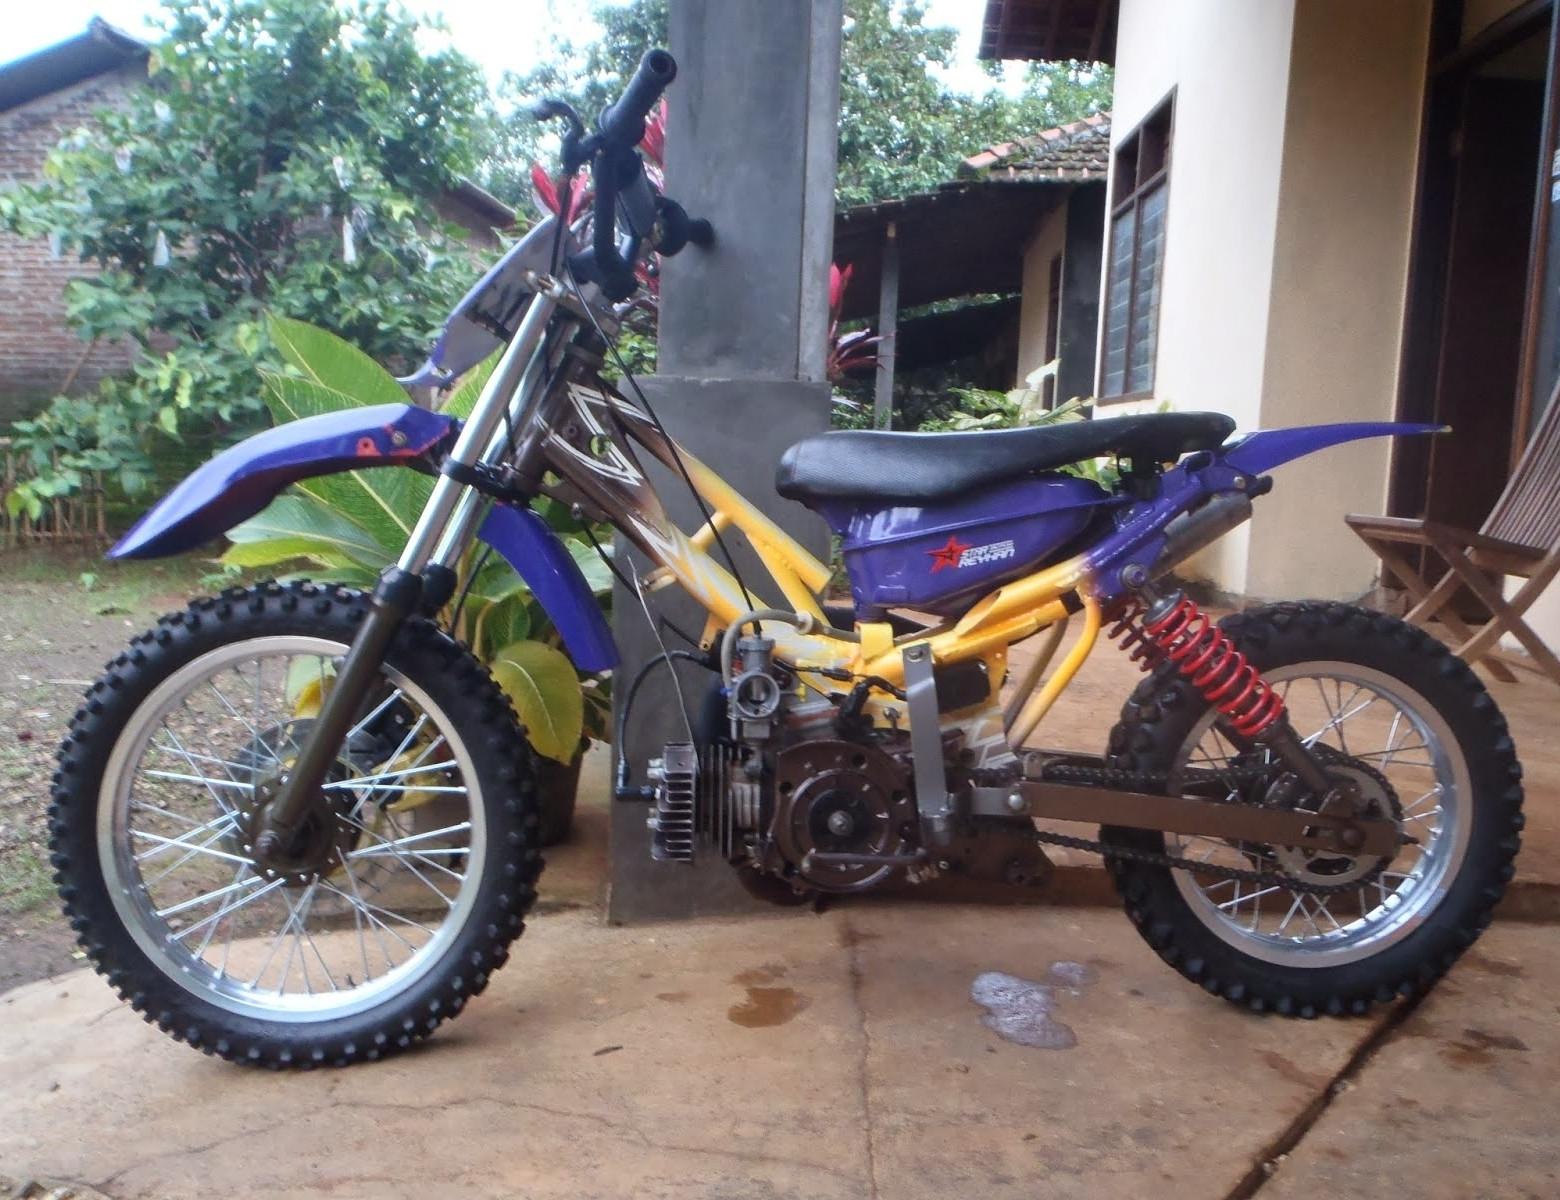 97 Modifikasi Motor Trail Odong Odong Terbaru Oneng Motomania